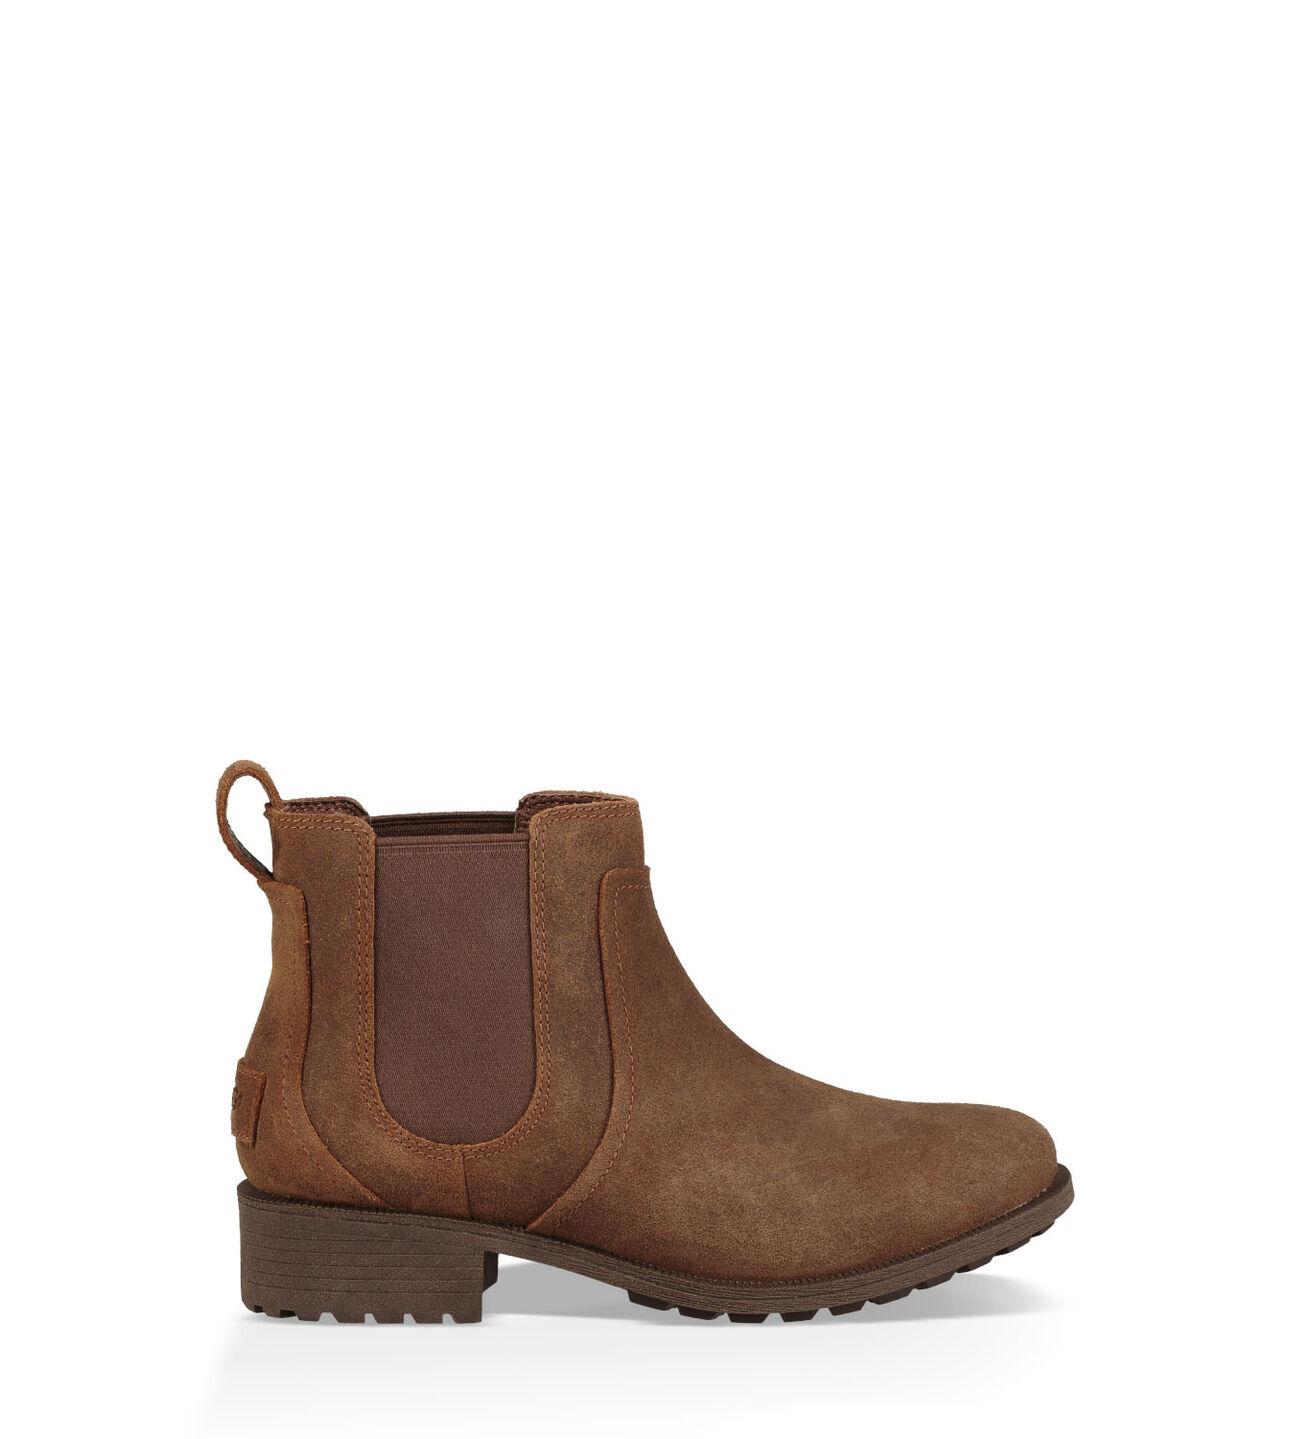 c9efa4dc2cf Bonham II Boot